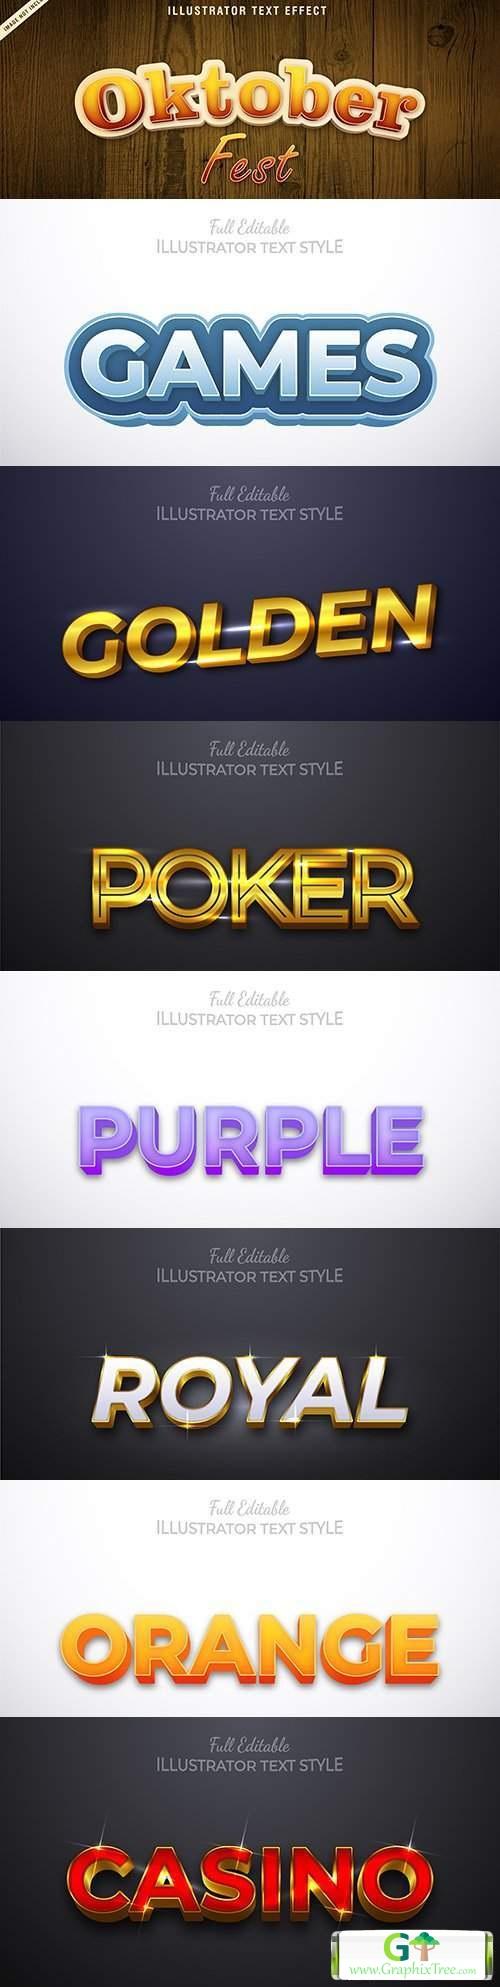 Editable font effect text collection illustration design 201